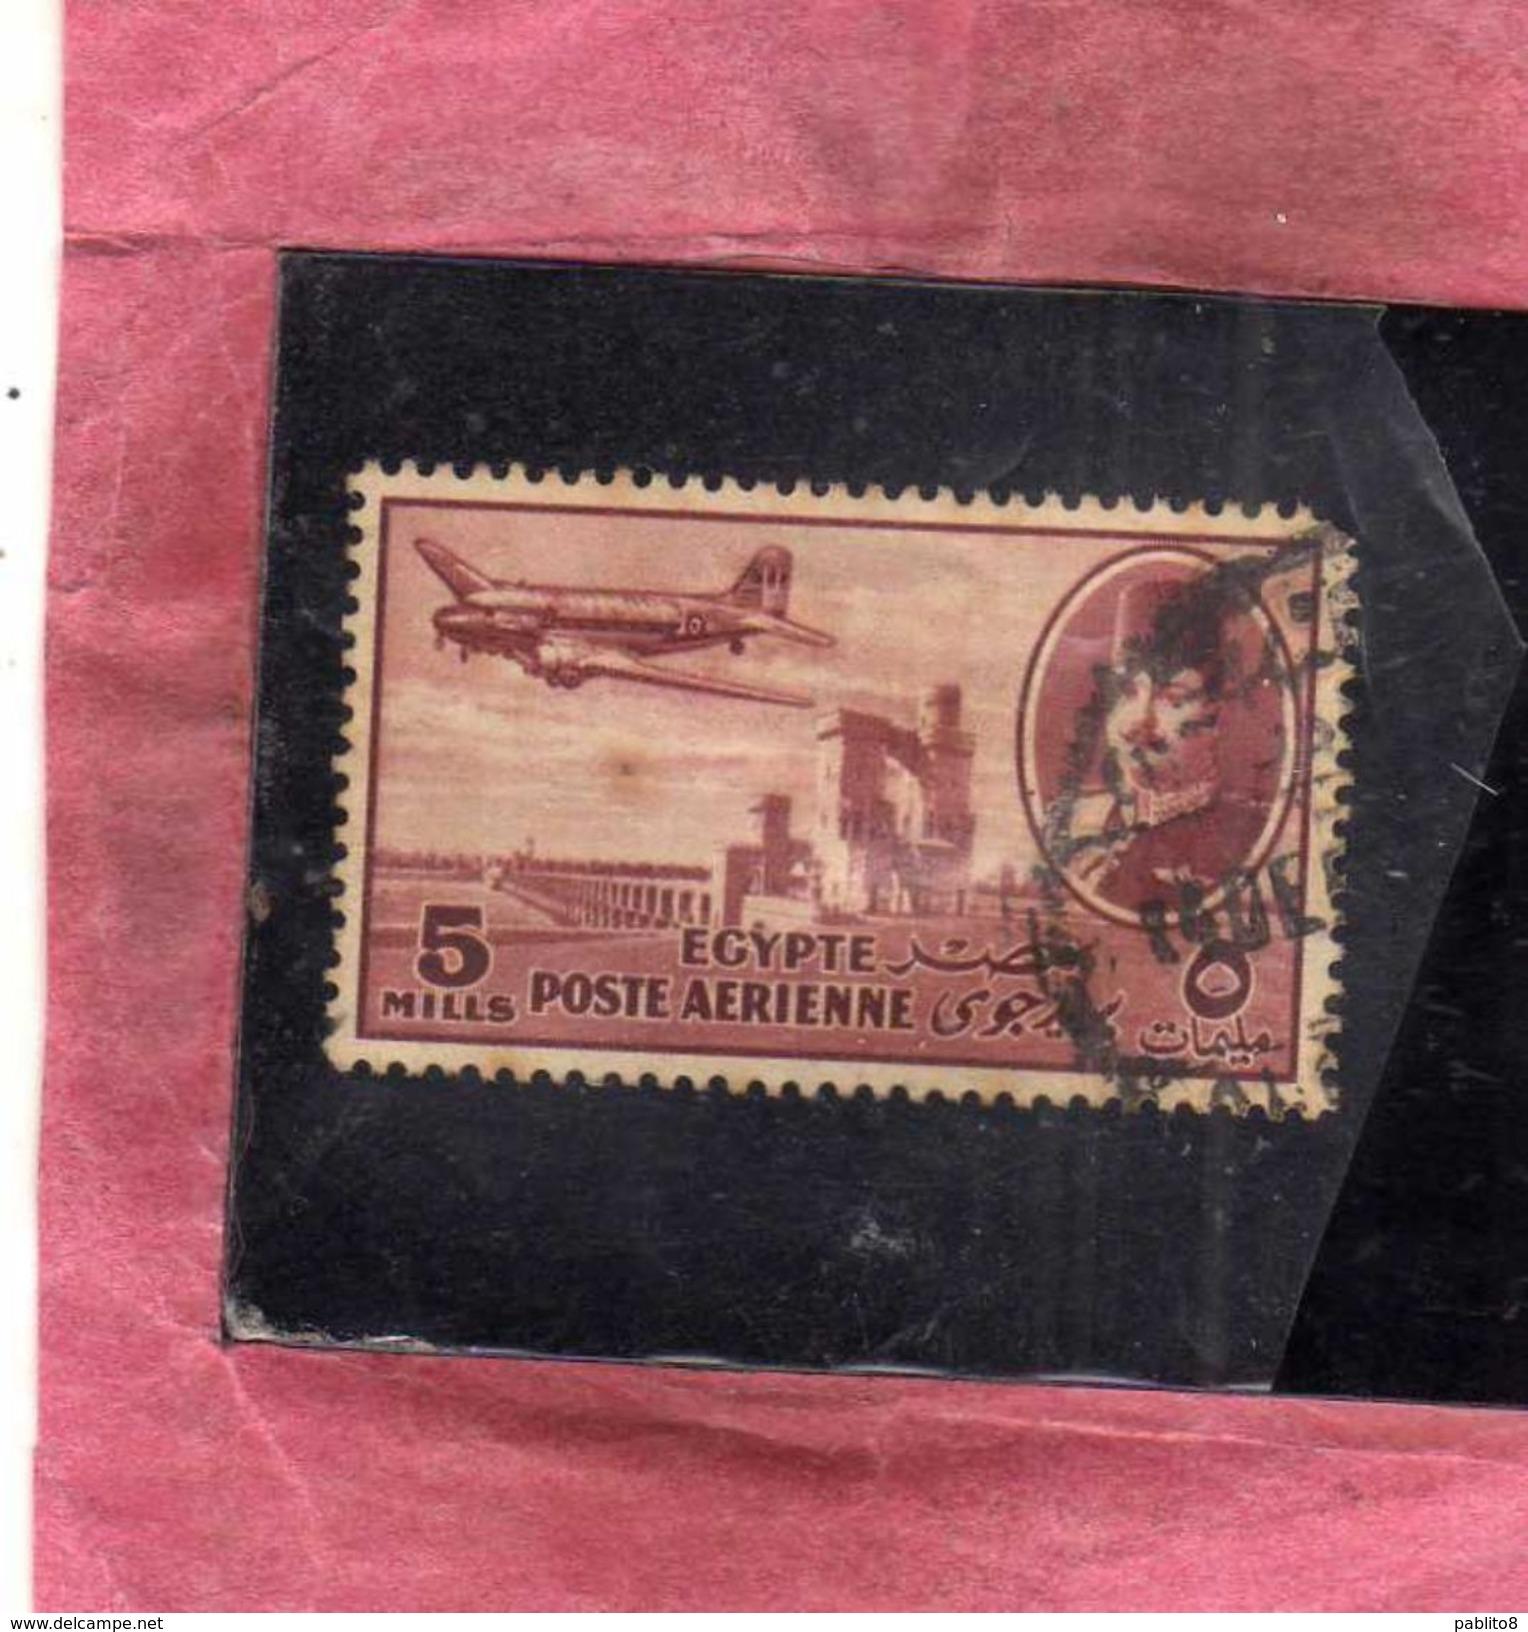 EGYPT EGITTO 1947 AIR MAIL POSTA AEREA KING FAROUK DELTA DAM DC-3 PLANE 5m USATO USED OBLITERE' - Posta Aerea